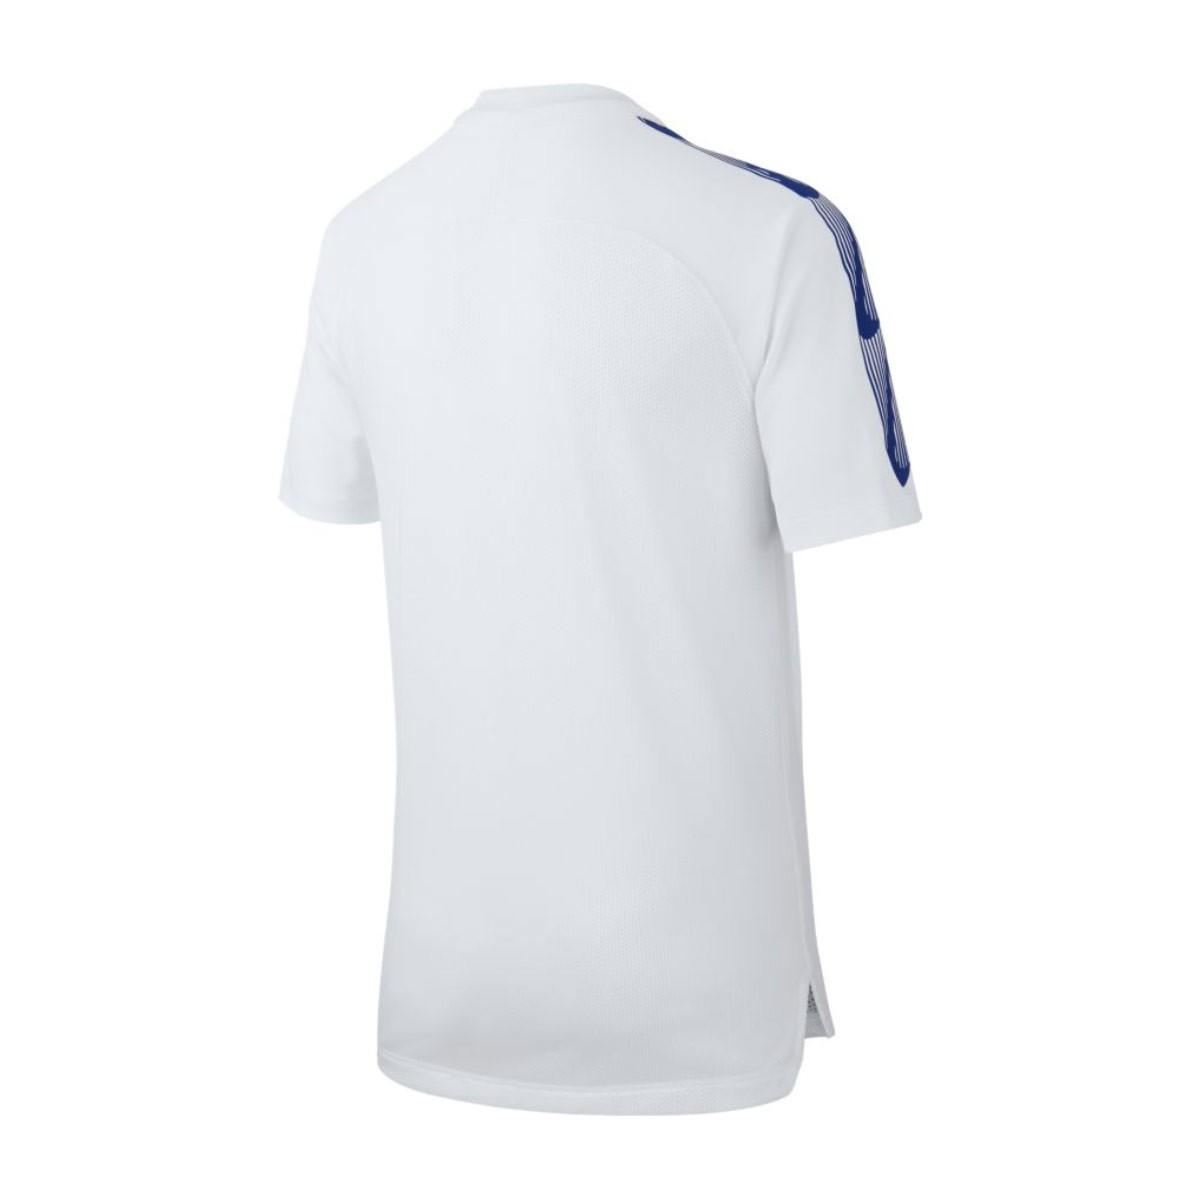 ac6ad74efb215 Camiseta Nike Chelsea FC Squad 2018-2019 Niño White-Rush blue - Tienda de fútbol  Fútbol Emotion